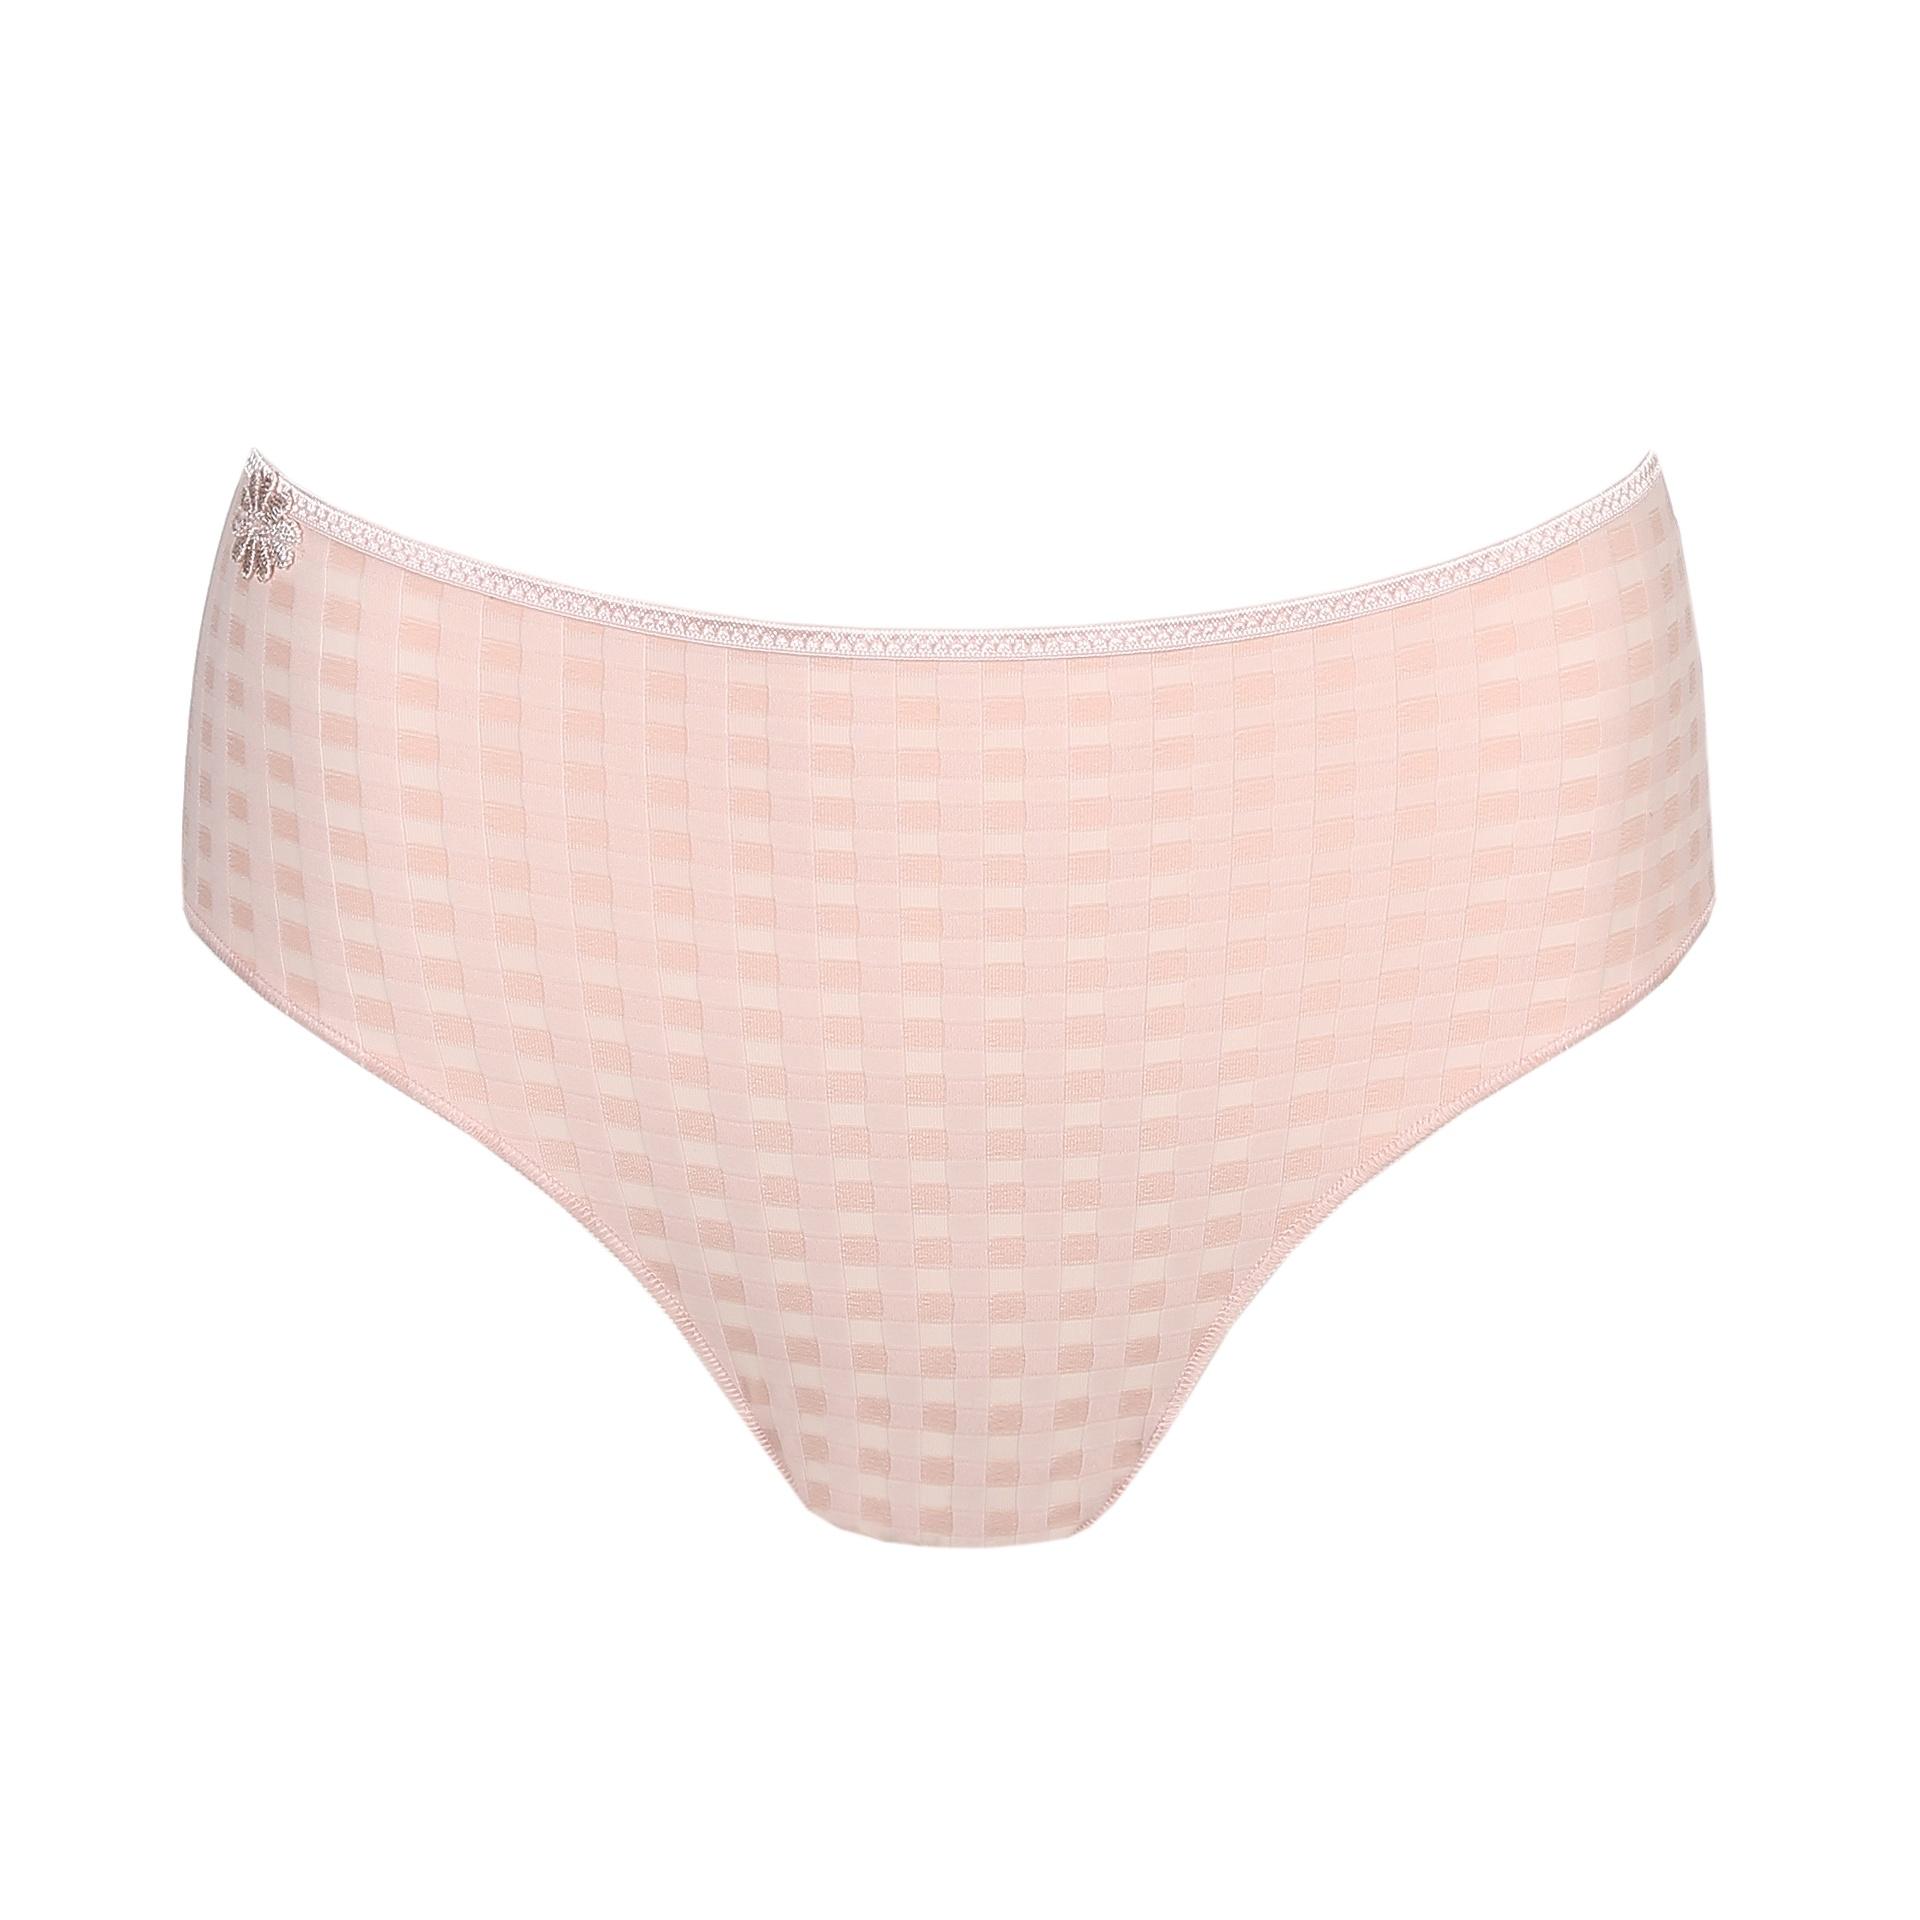 Marie Jo Marie Jo Avero tailleslip 38-46 pearly pink